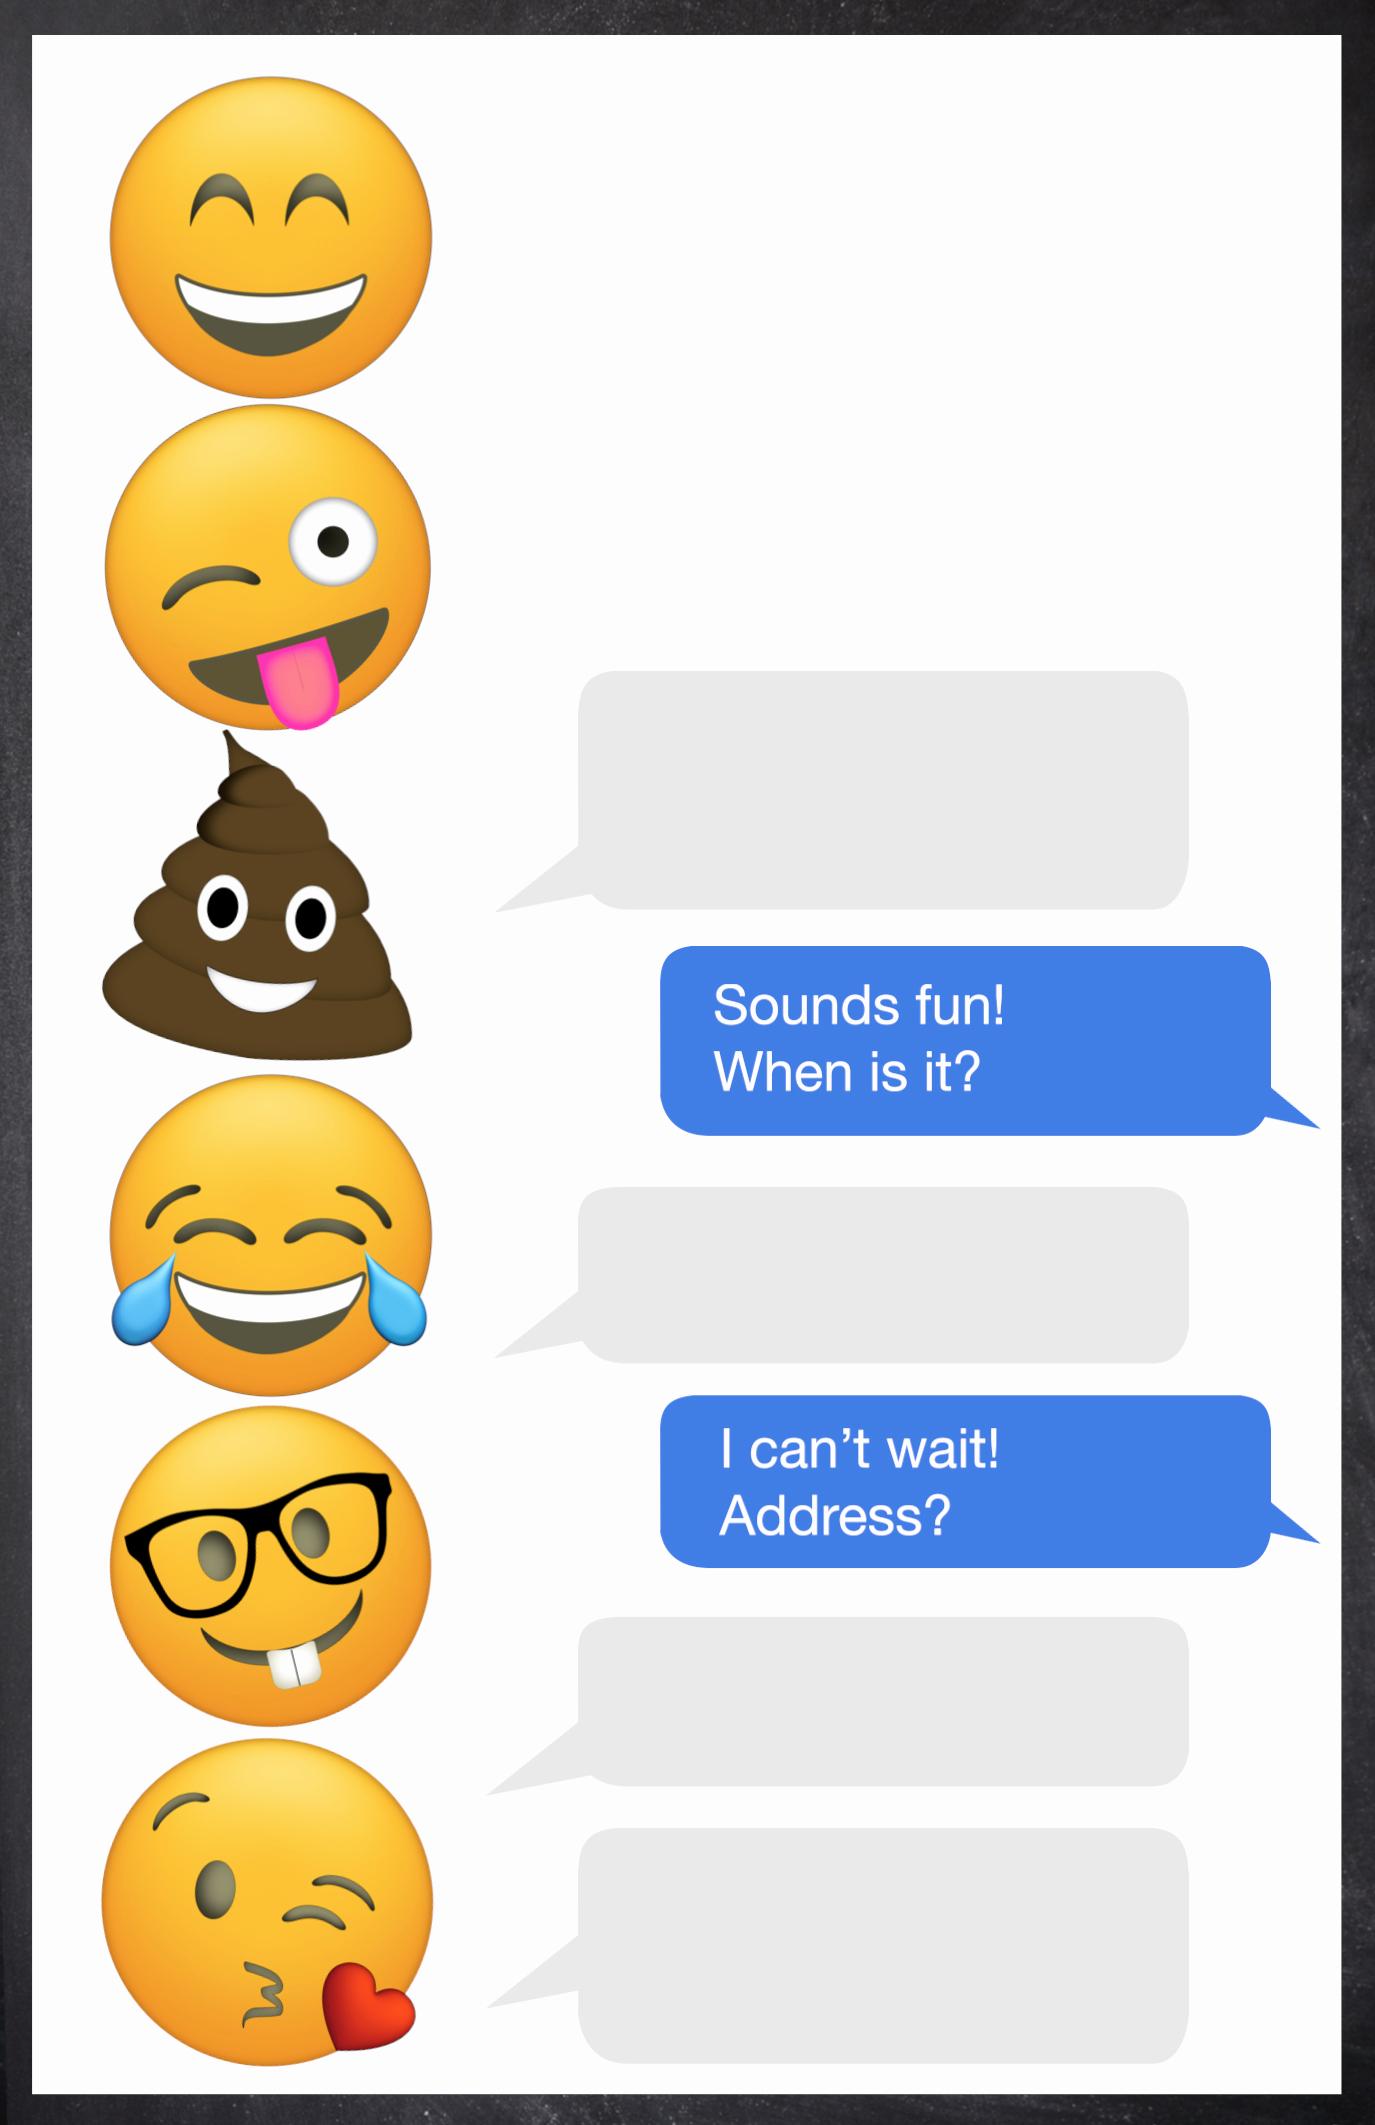 Free Printable Birthday Invitation Templates Elegant Emoji Birthday Invitations Free Printable Template Paper